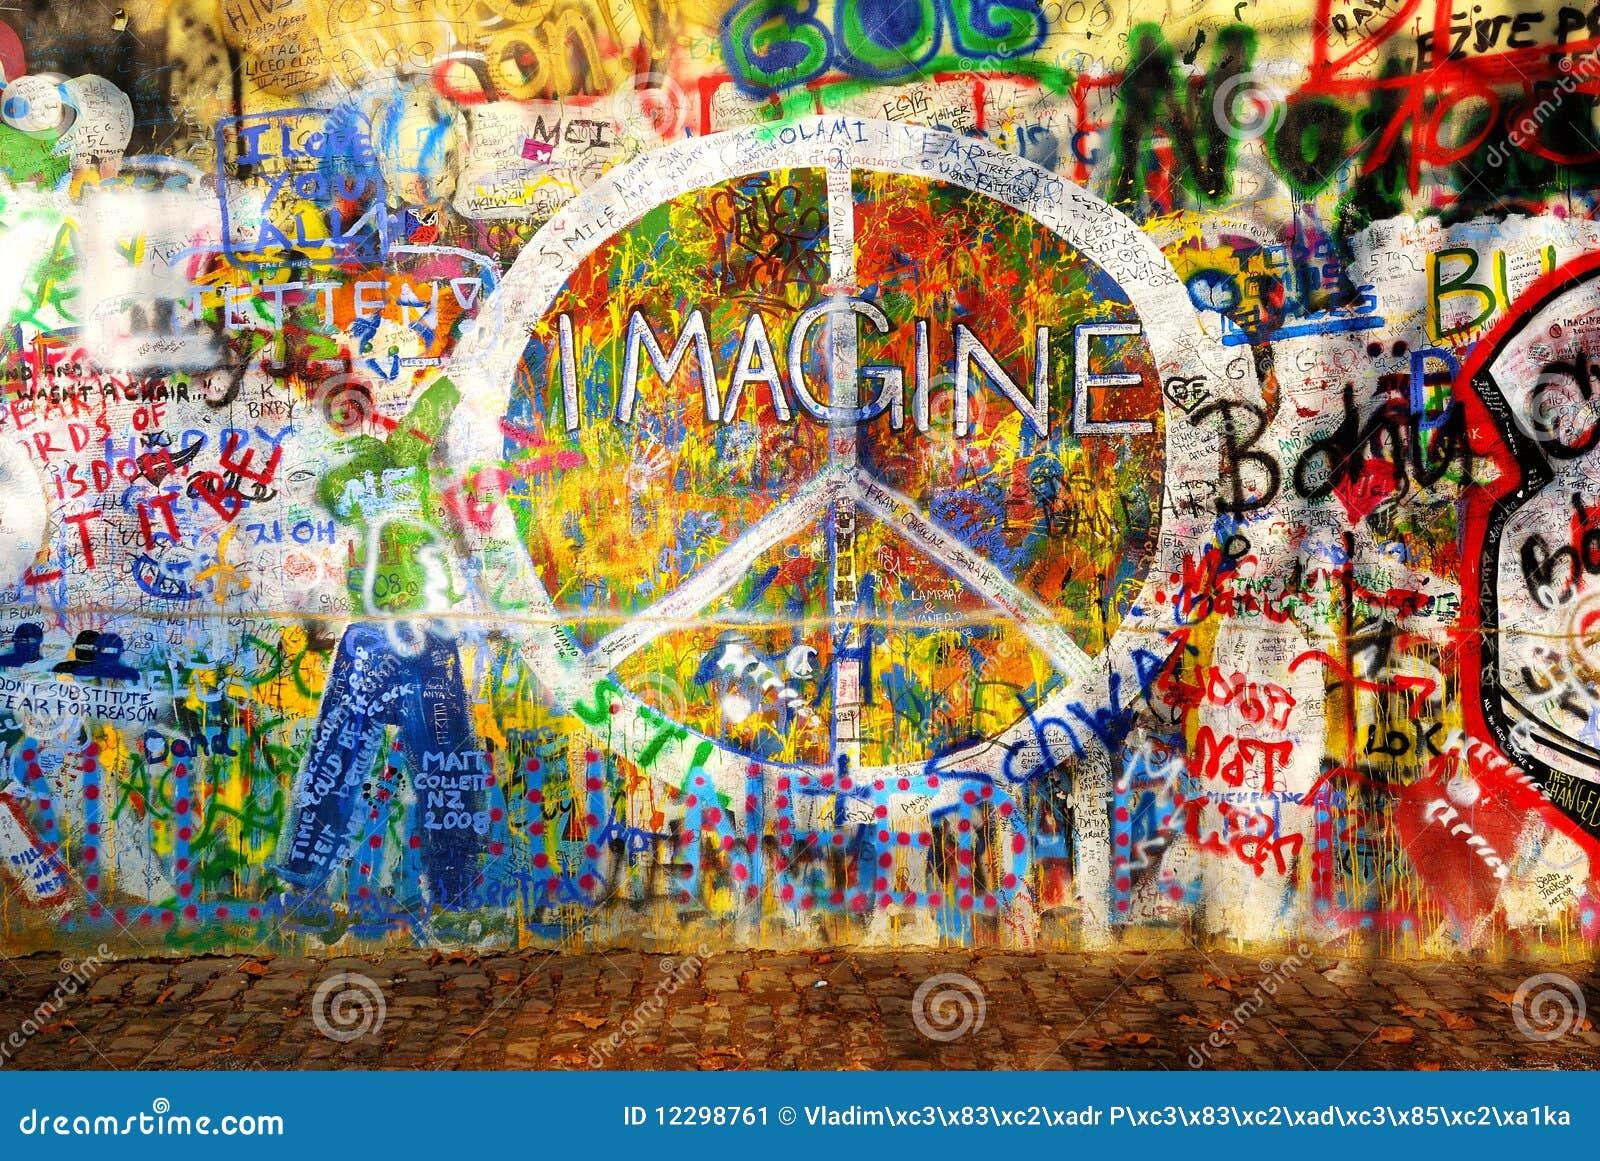 Imaginez le mur